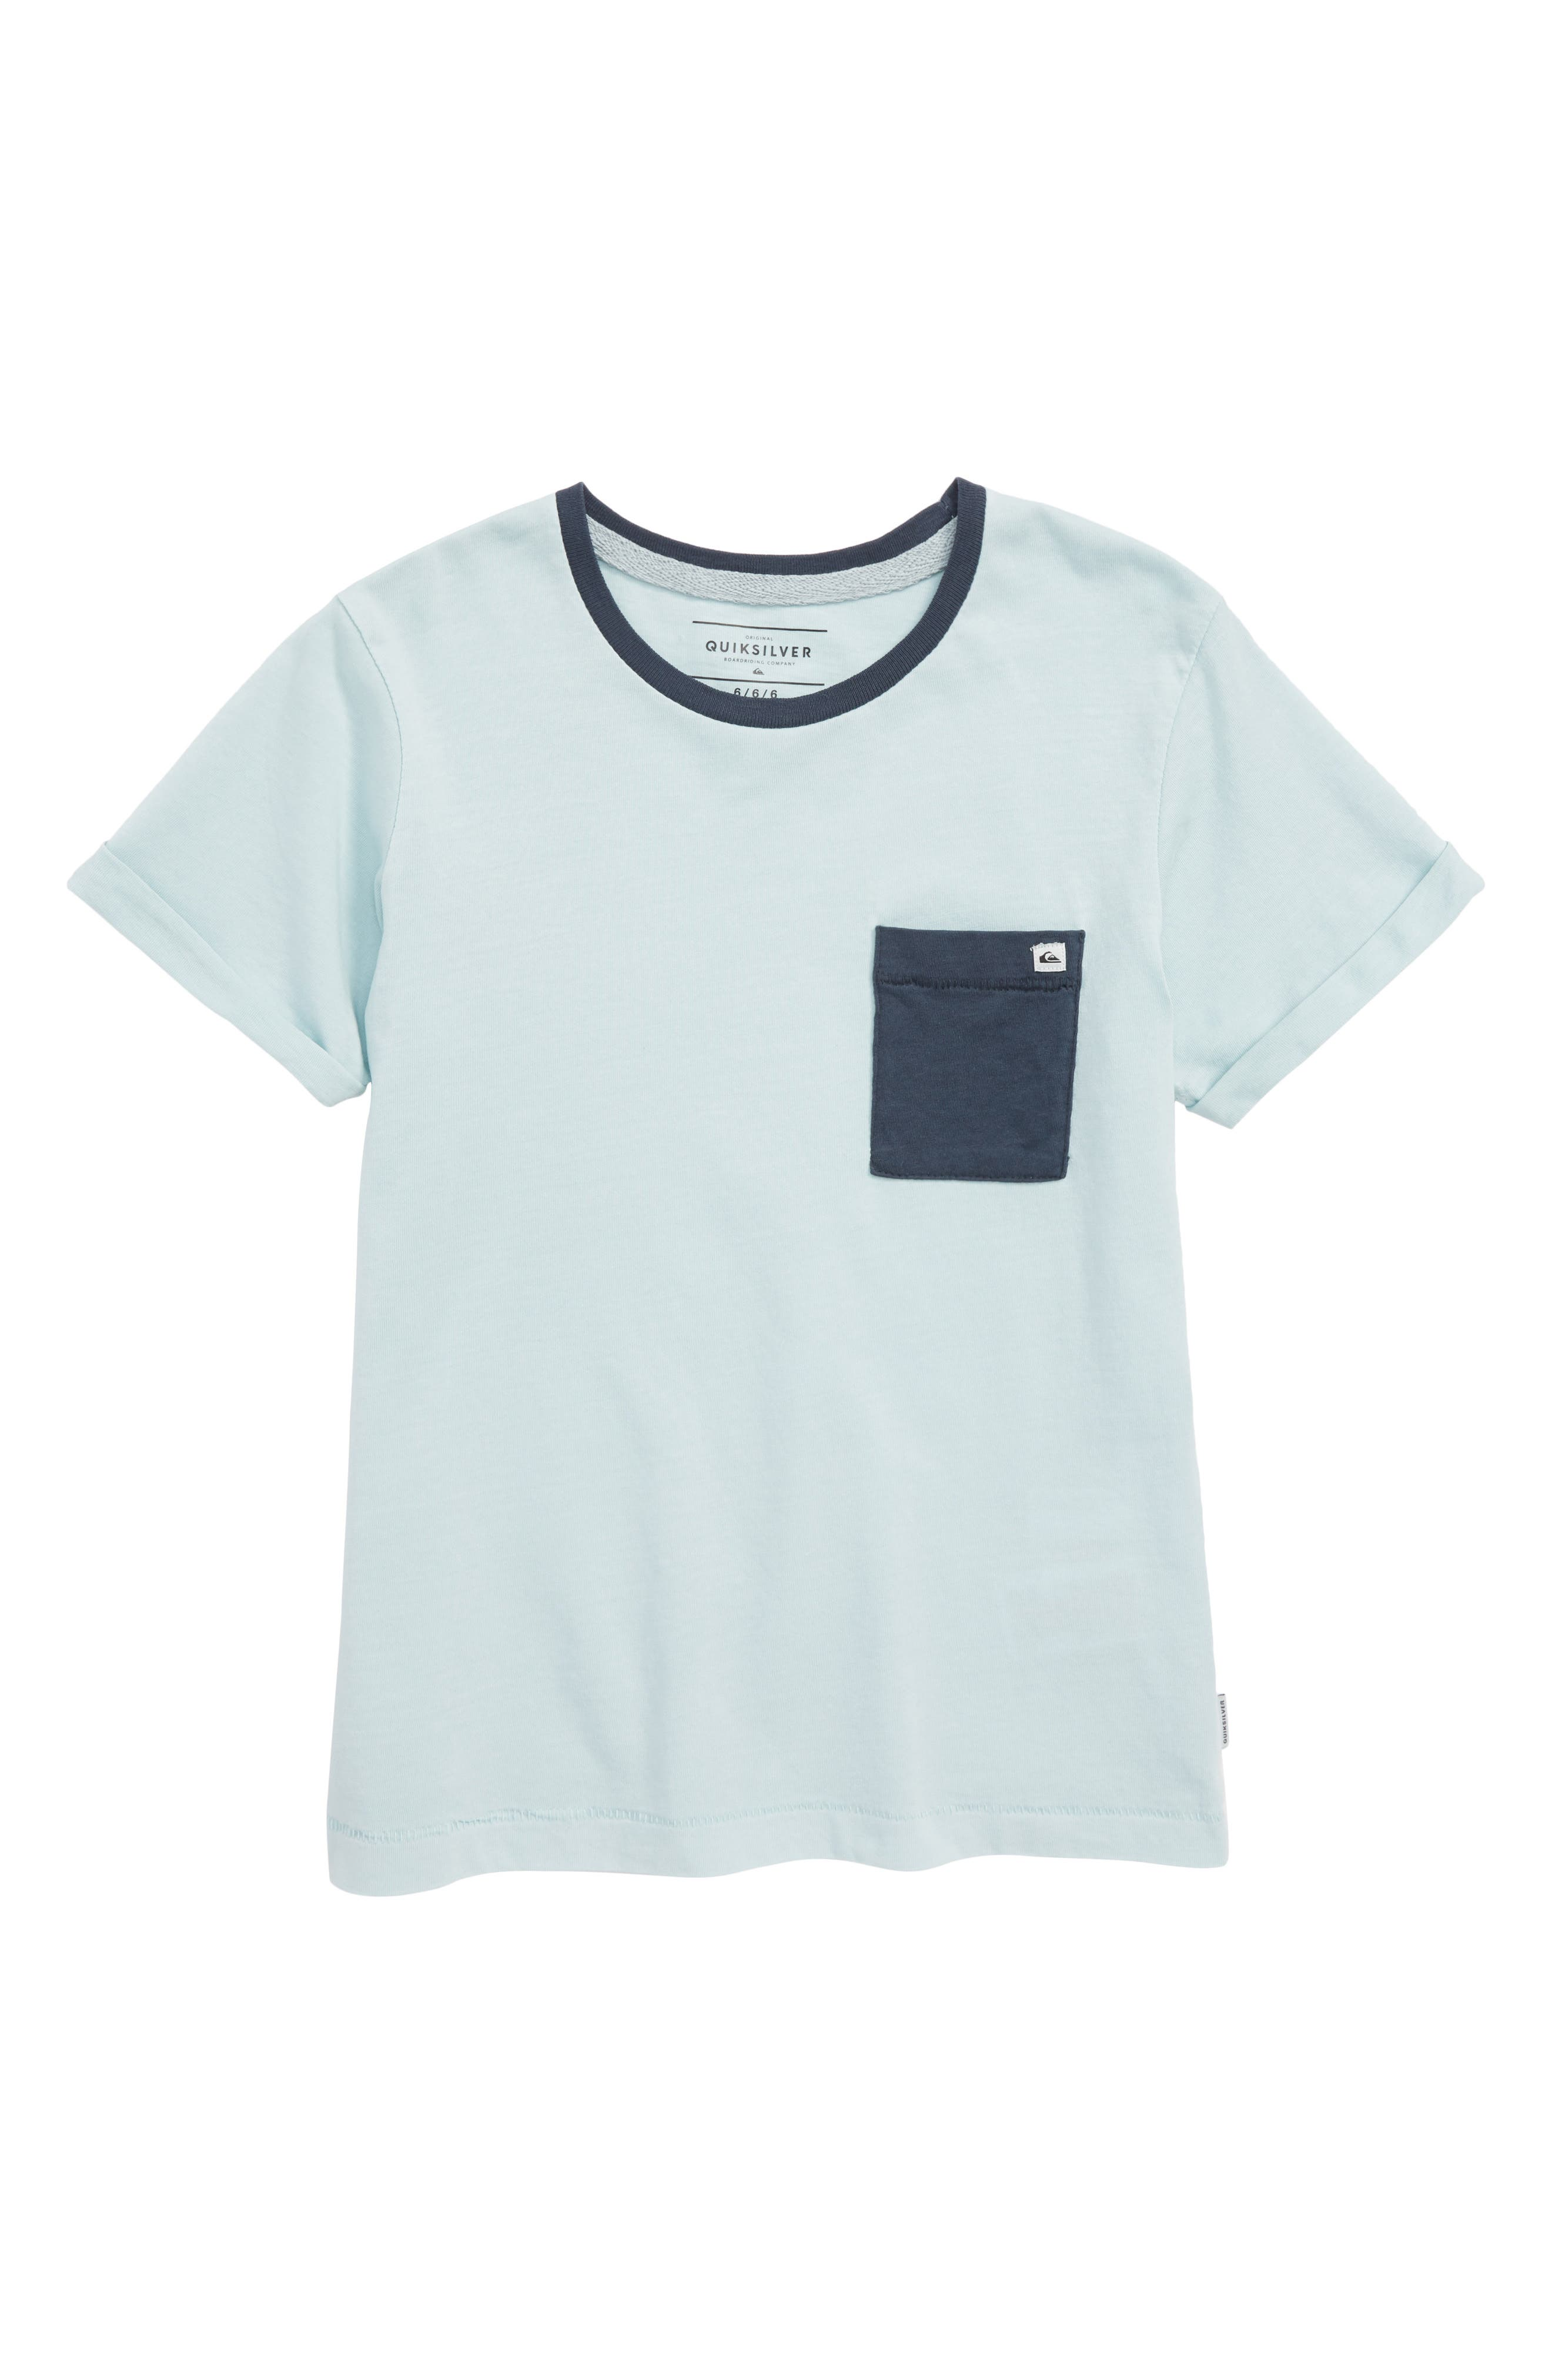 Papaikou Shirt,                             Main thumbnail 1, color,                             400